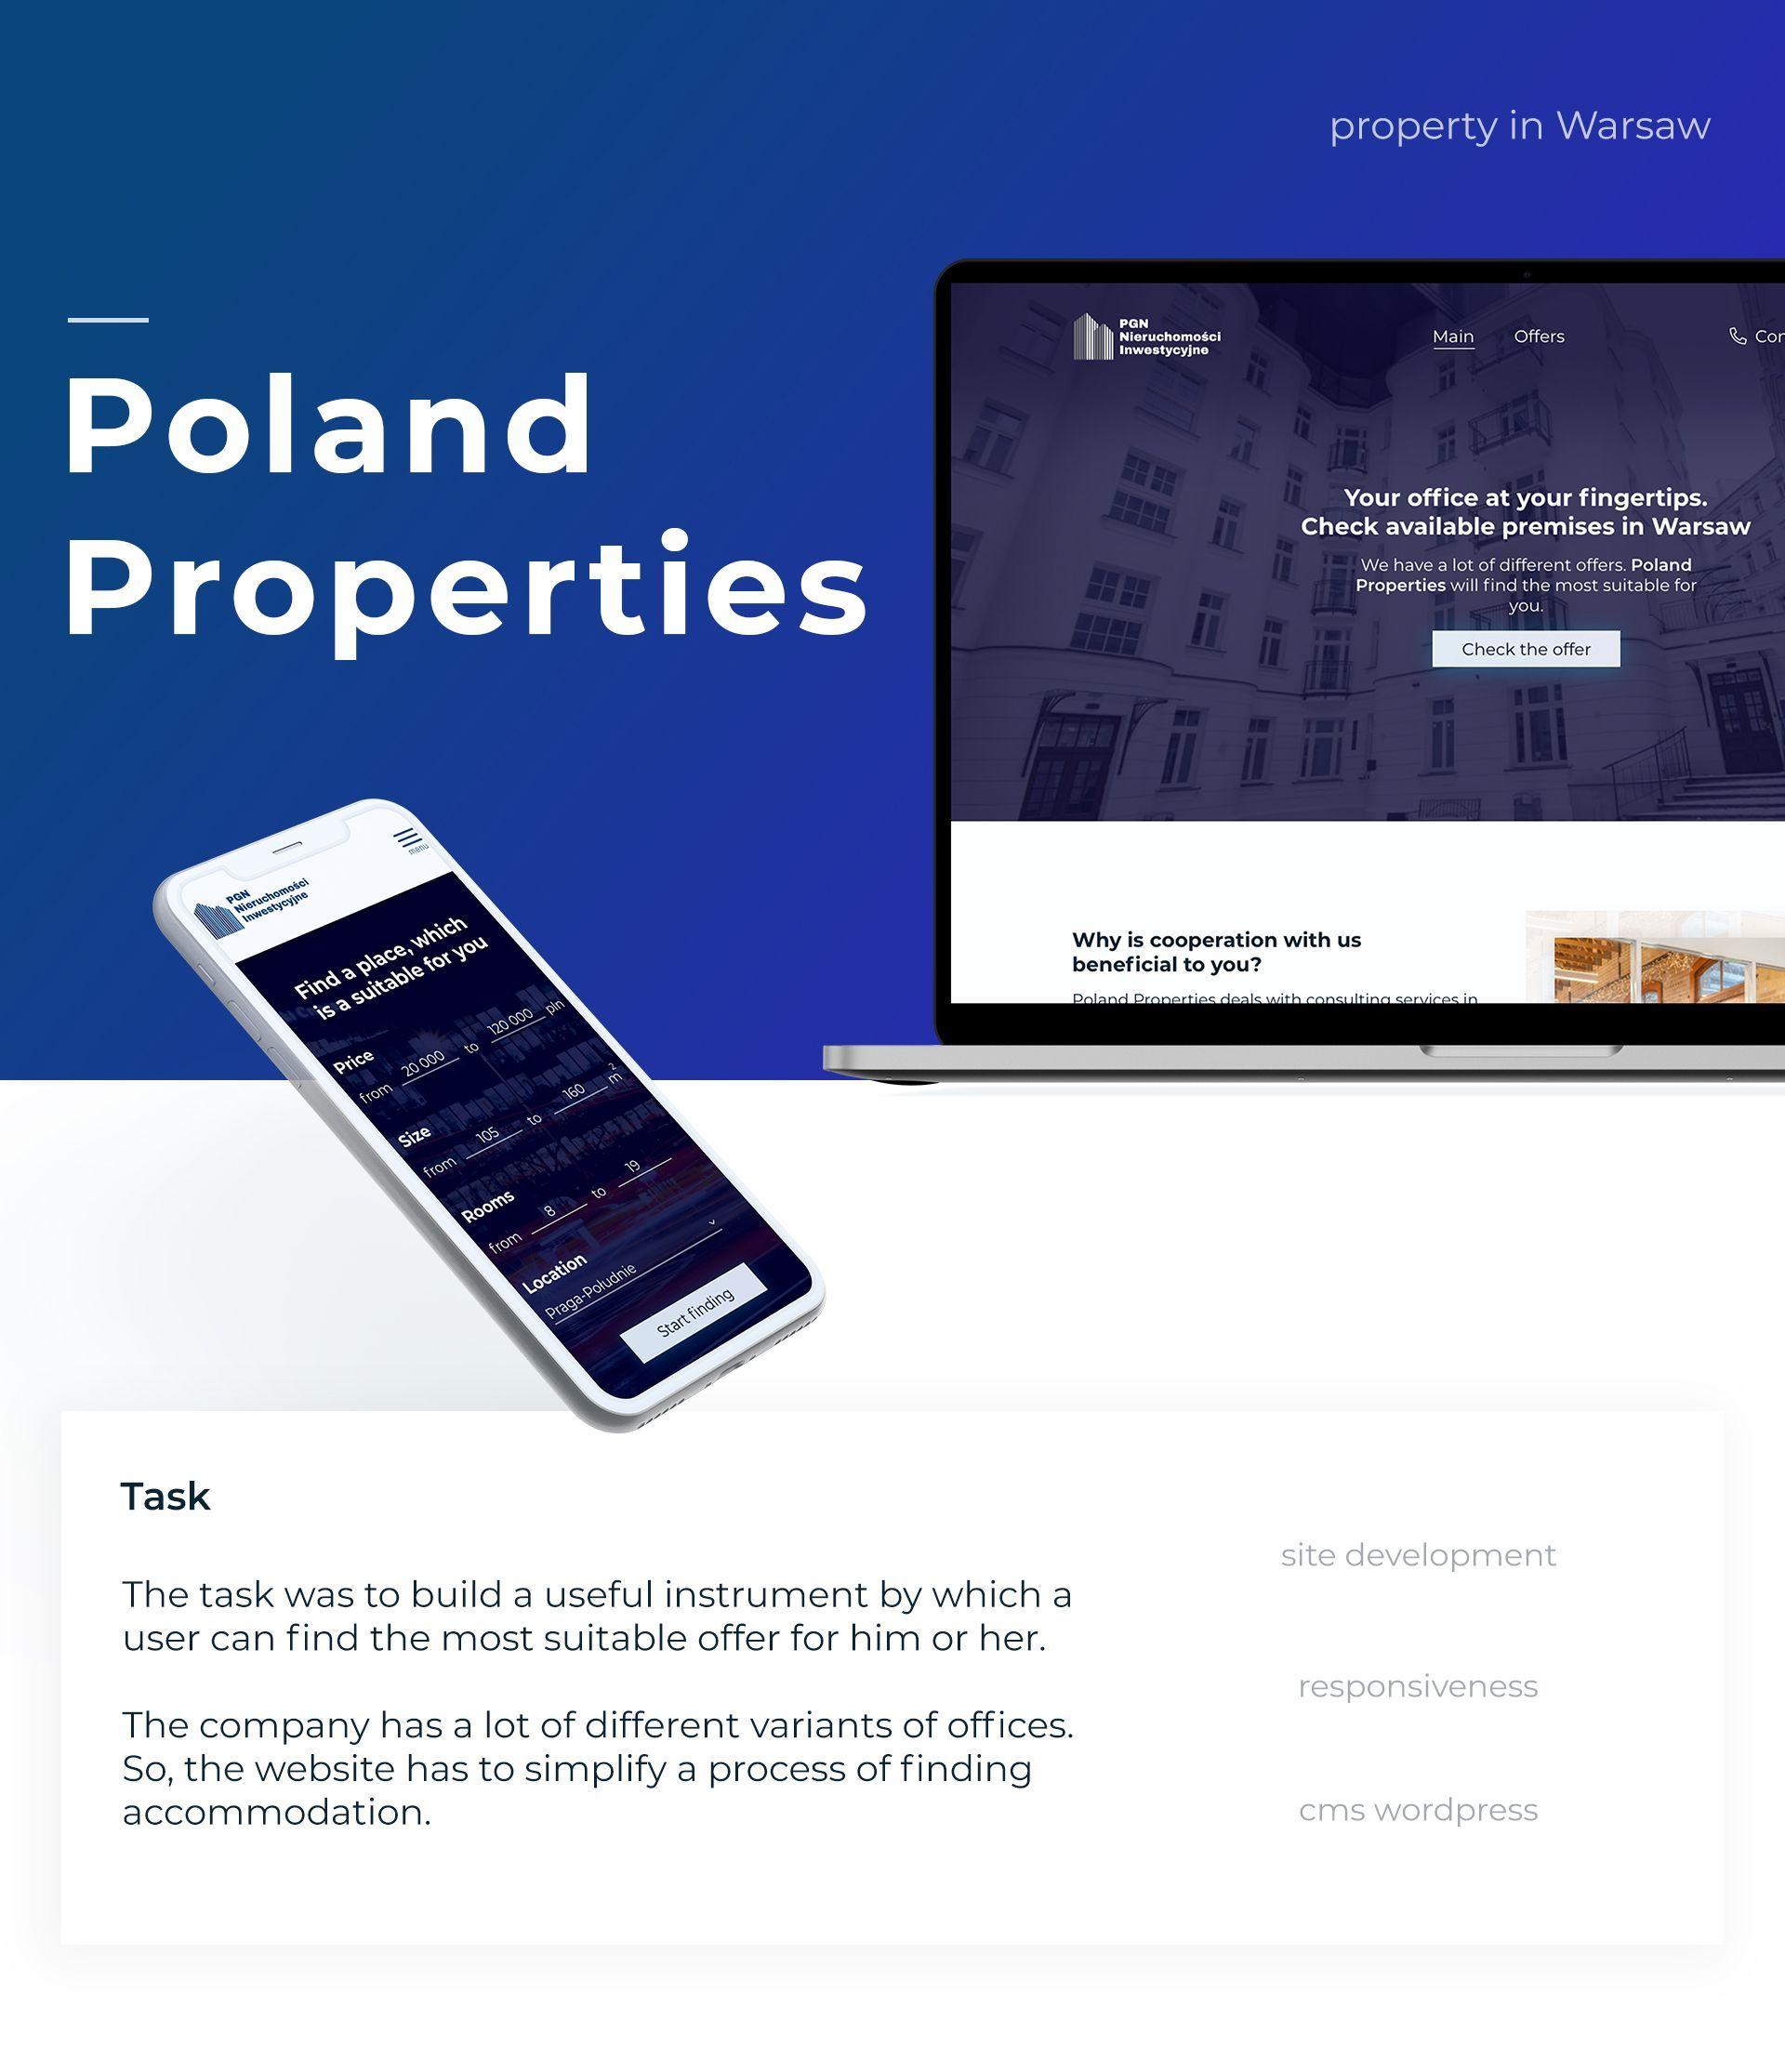 Poland Properties